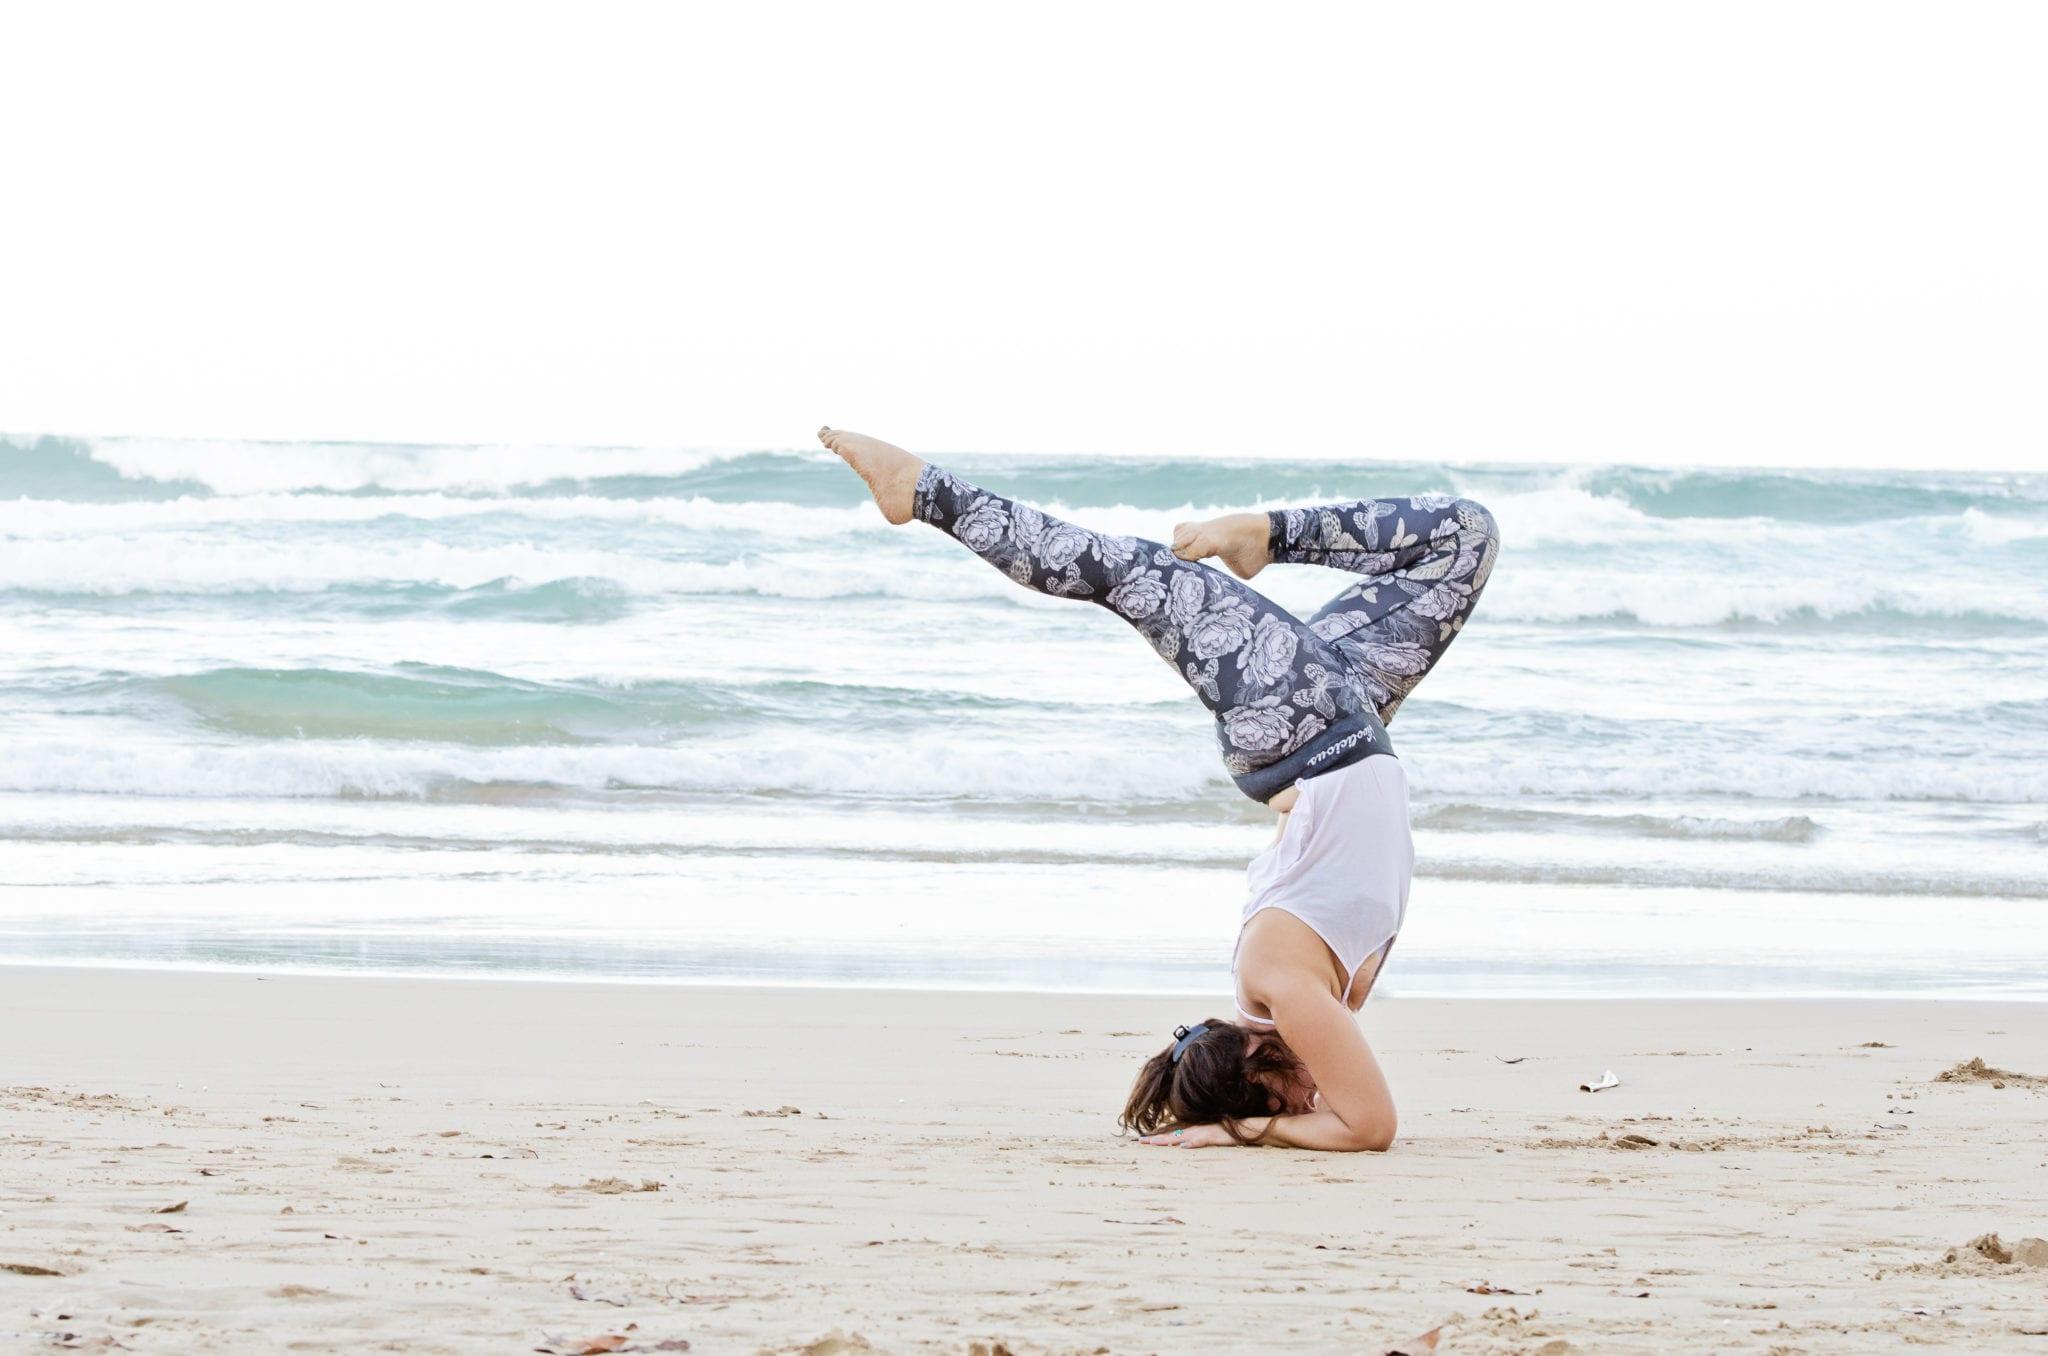 BloomYoga 200hrs Yoga Teacher Training in Bayonne, Basque Country,SW France/Yoga Alliance Certified